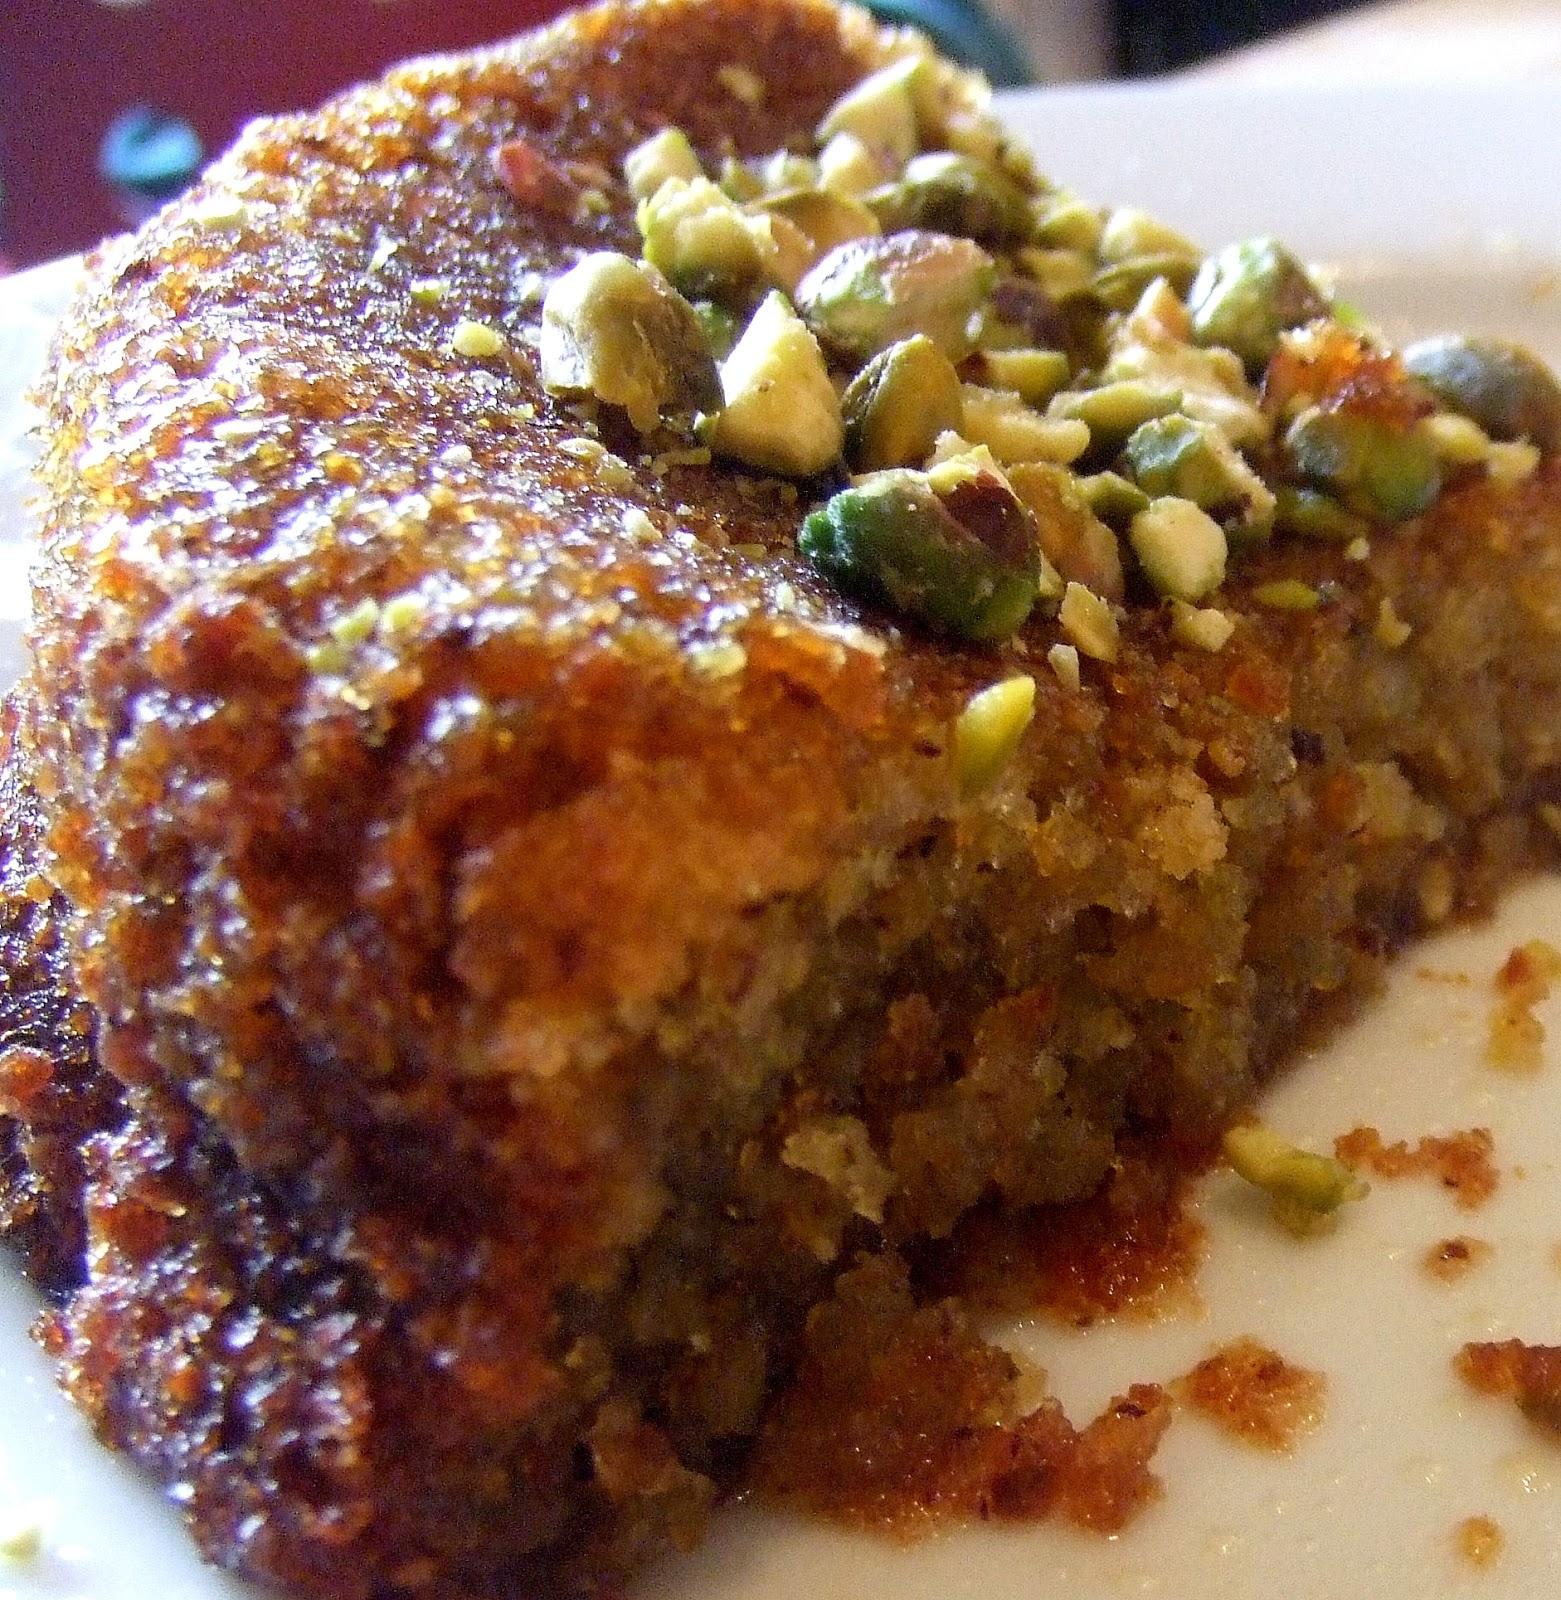 Petit Pois: Pistachio and olive oil cake